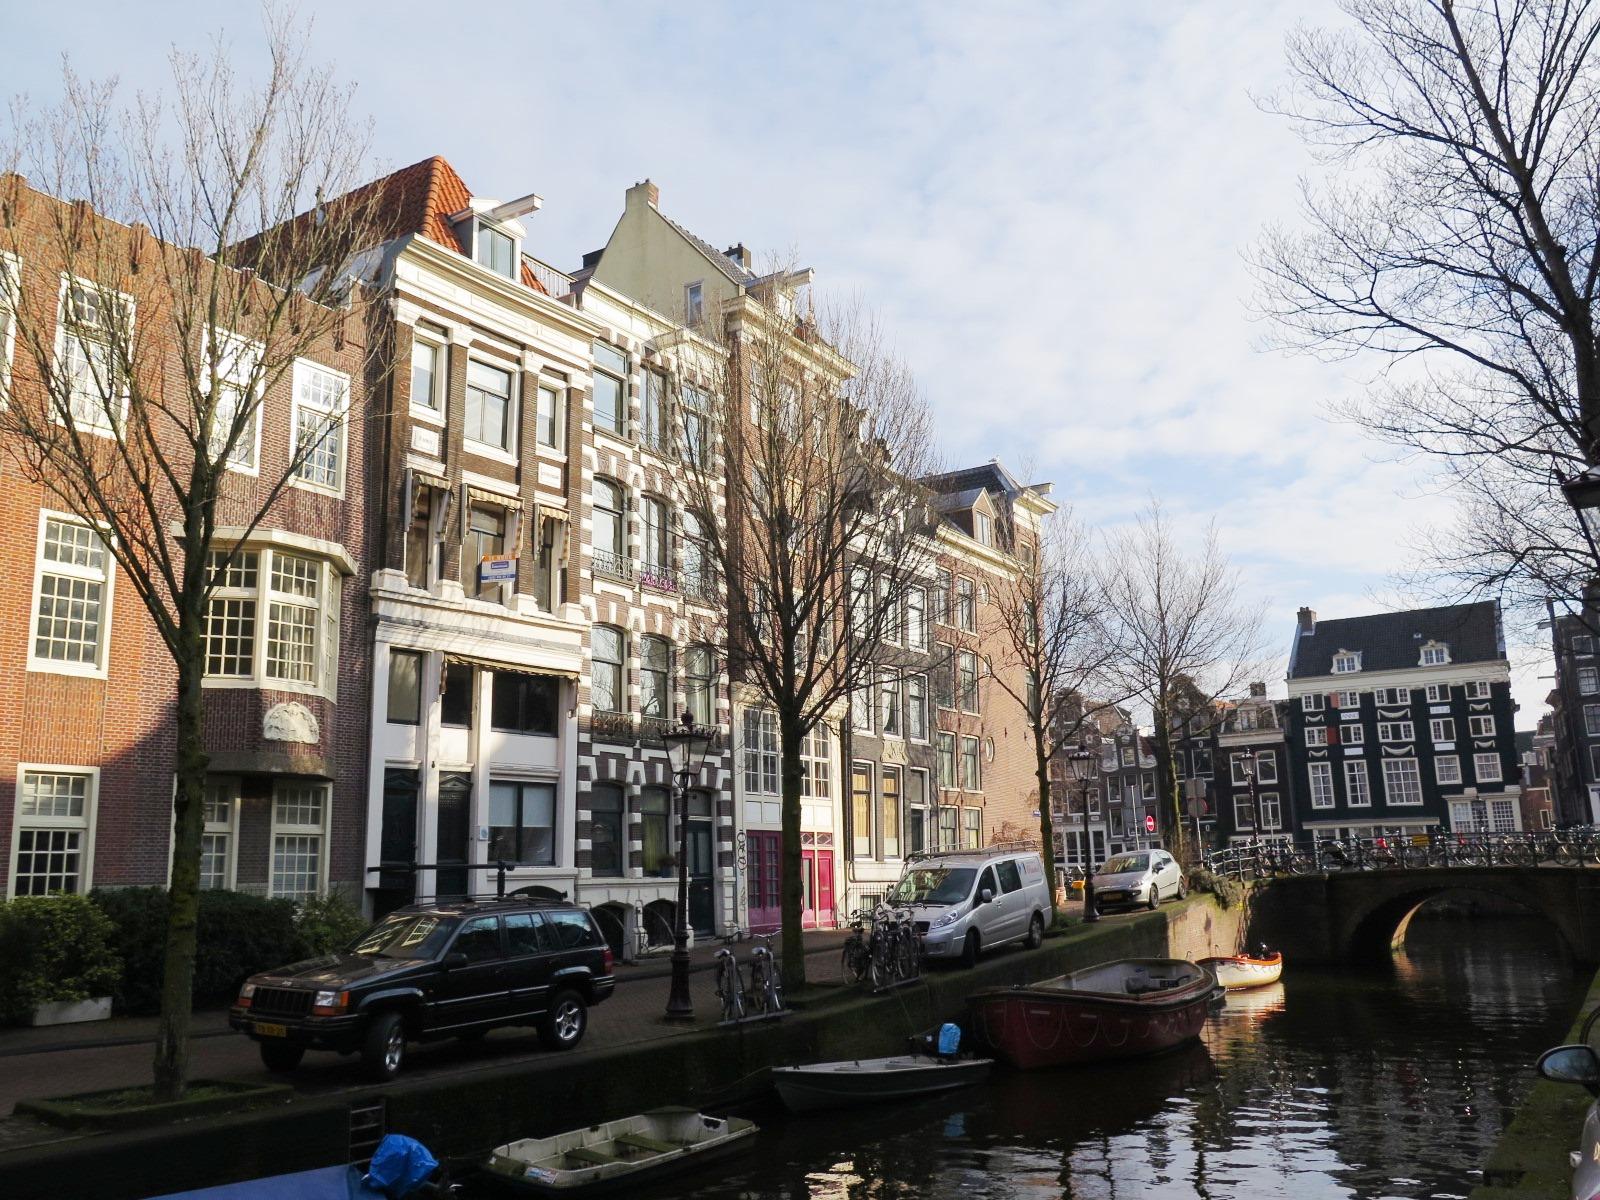 Blauwburgwal, Amsterdam